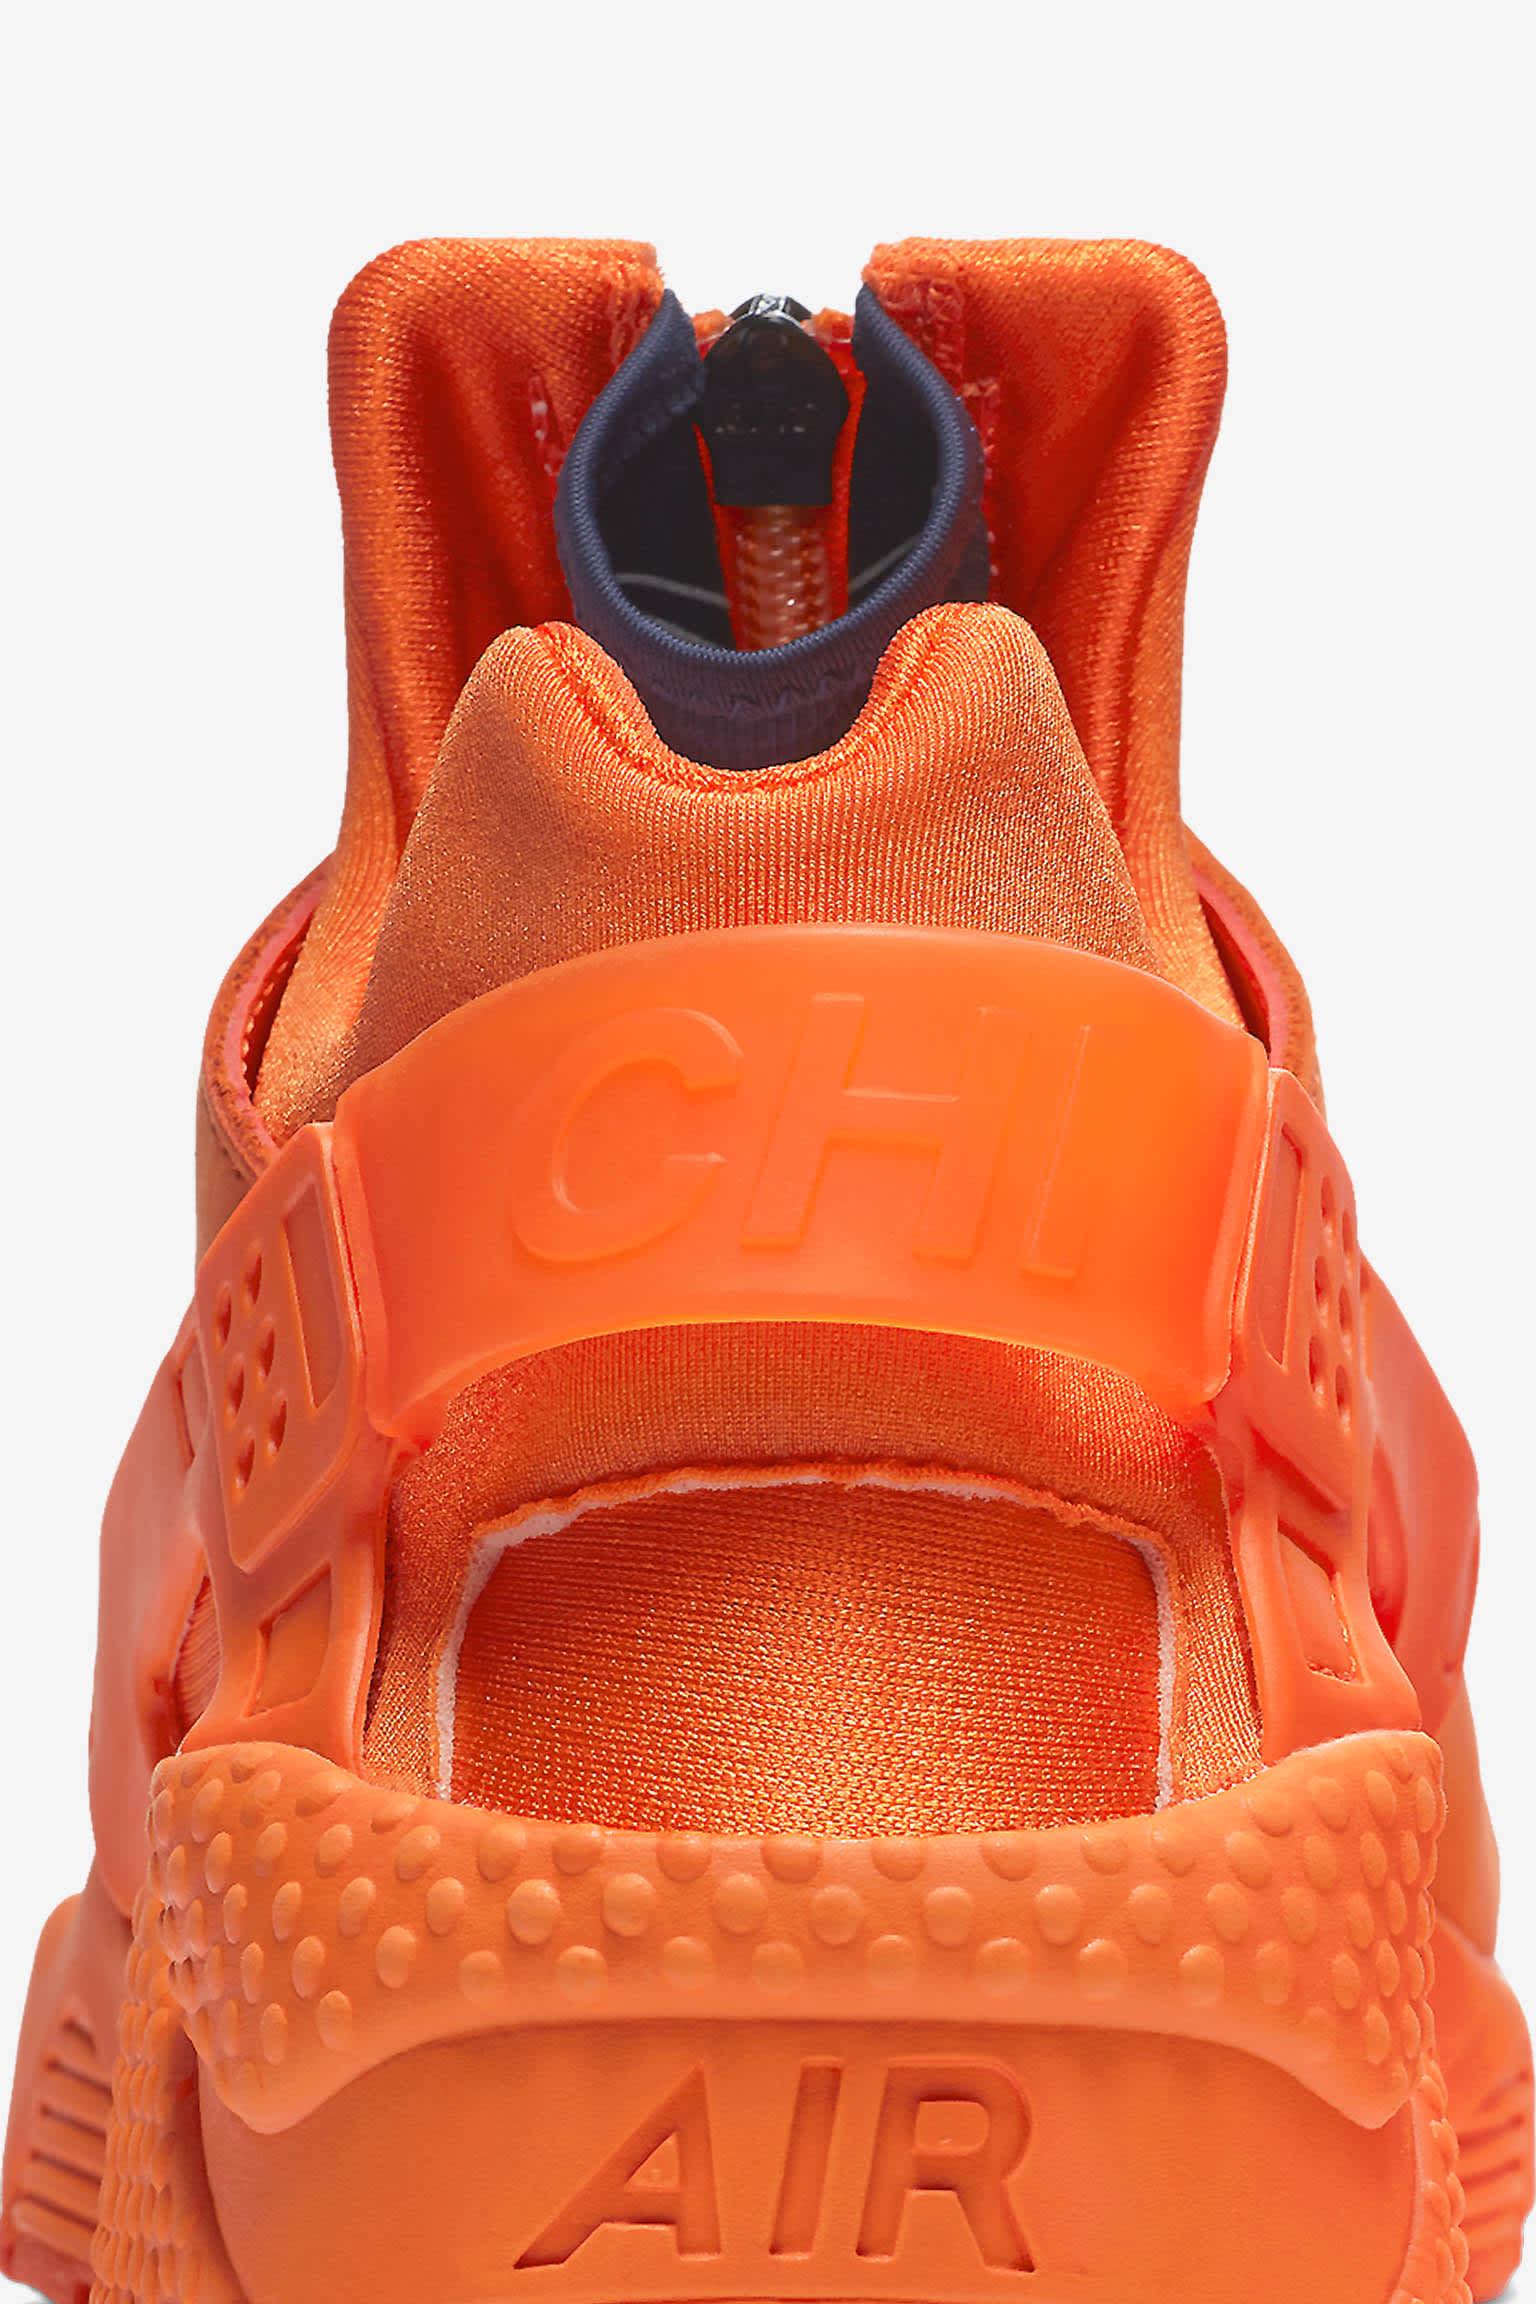 Nike Air Huarache Run 'Orange Blaze & Midnight Navy' Release Date ...